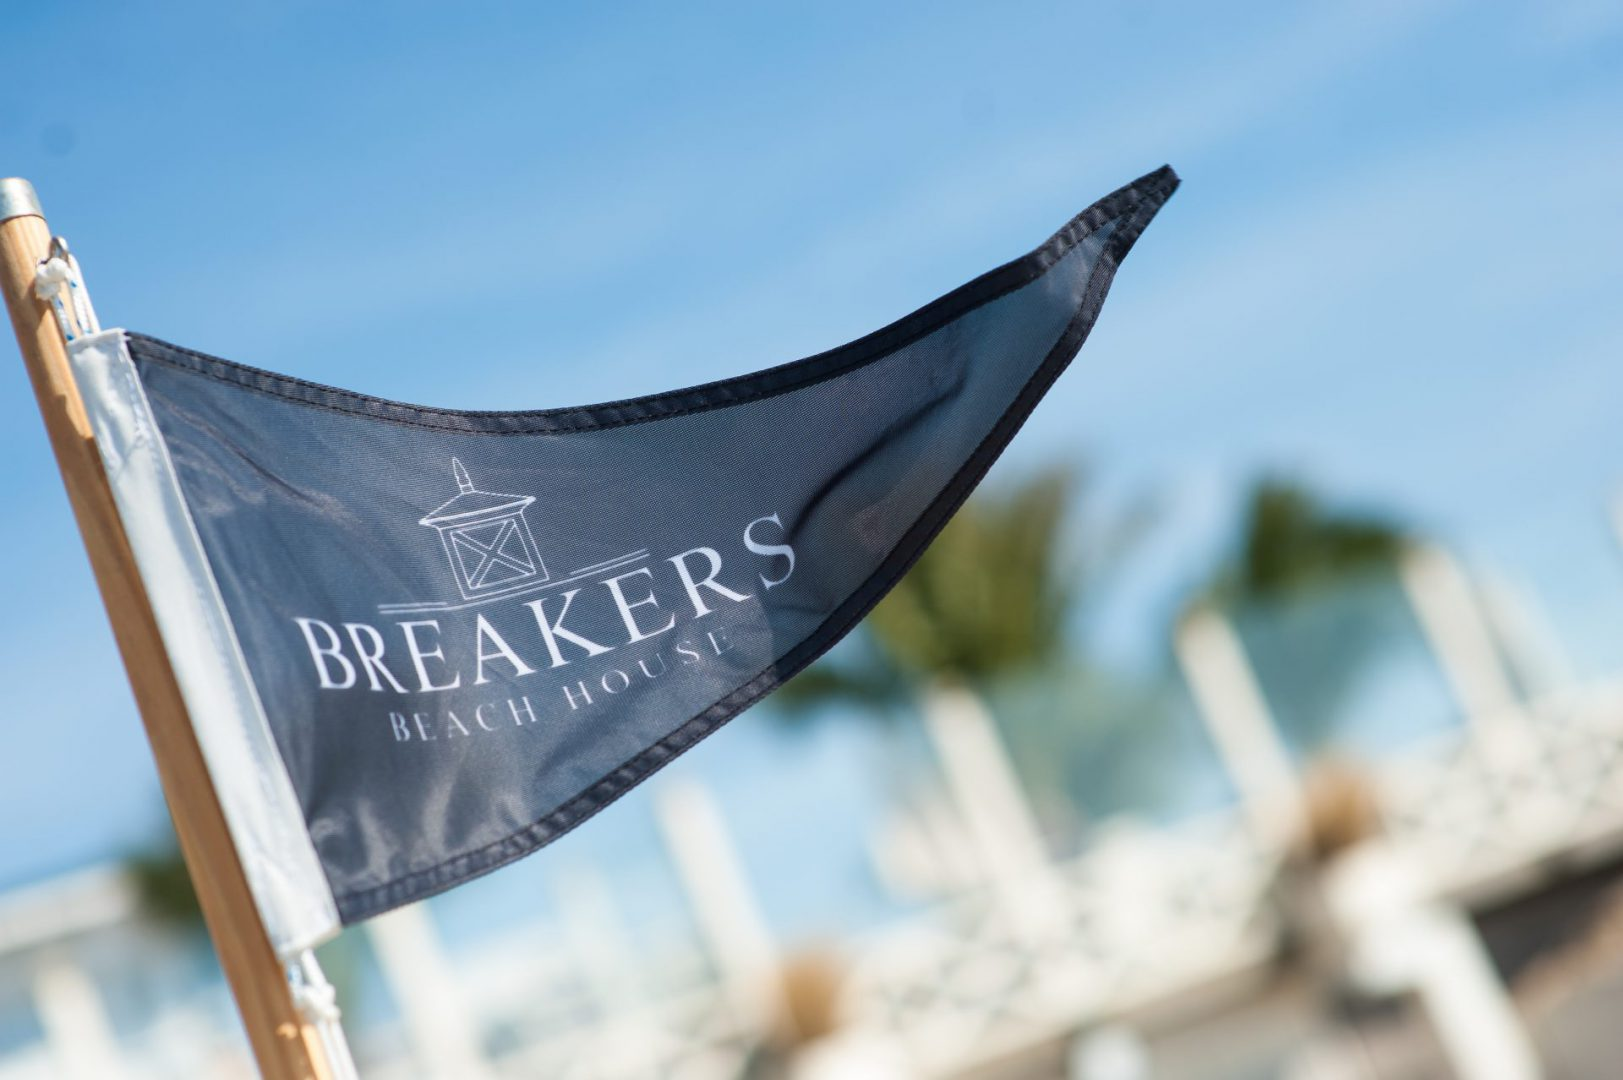 Breakers Bell'agio